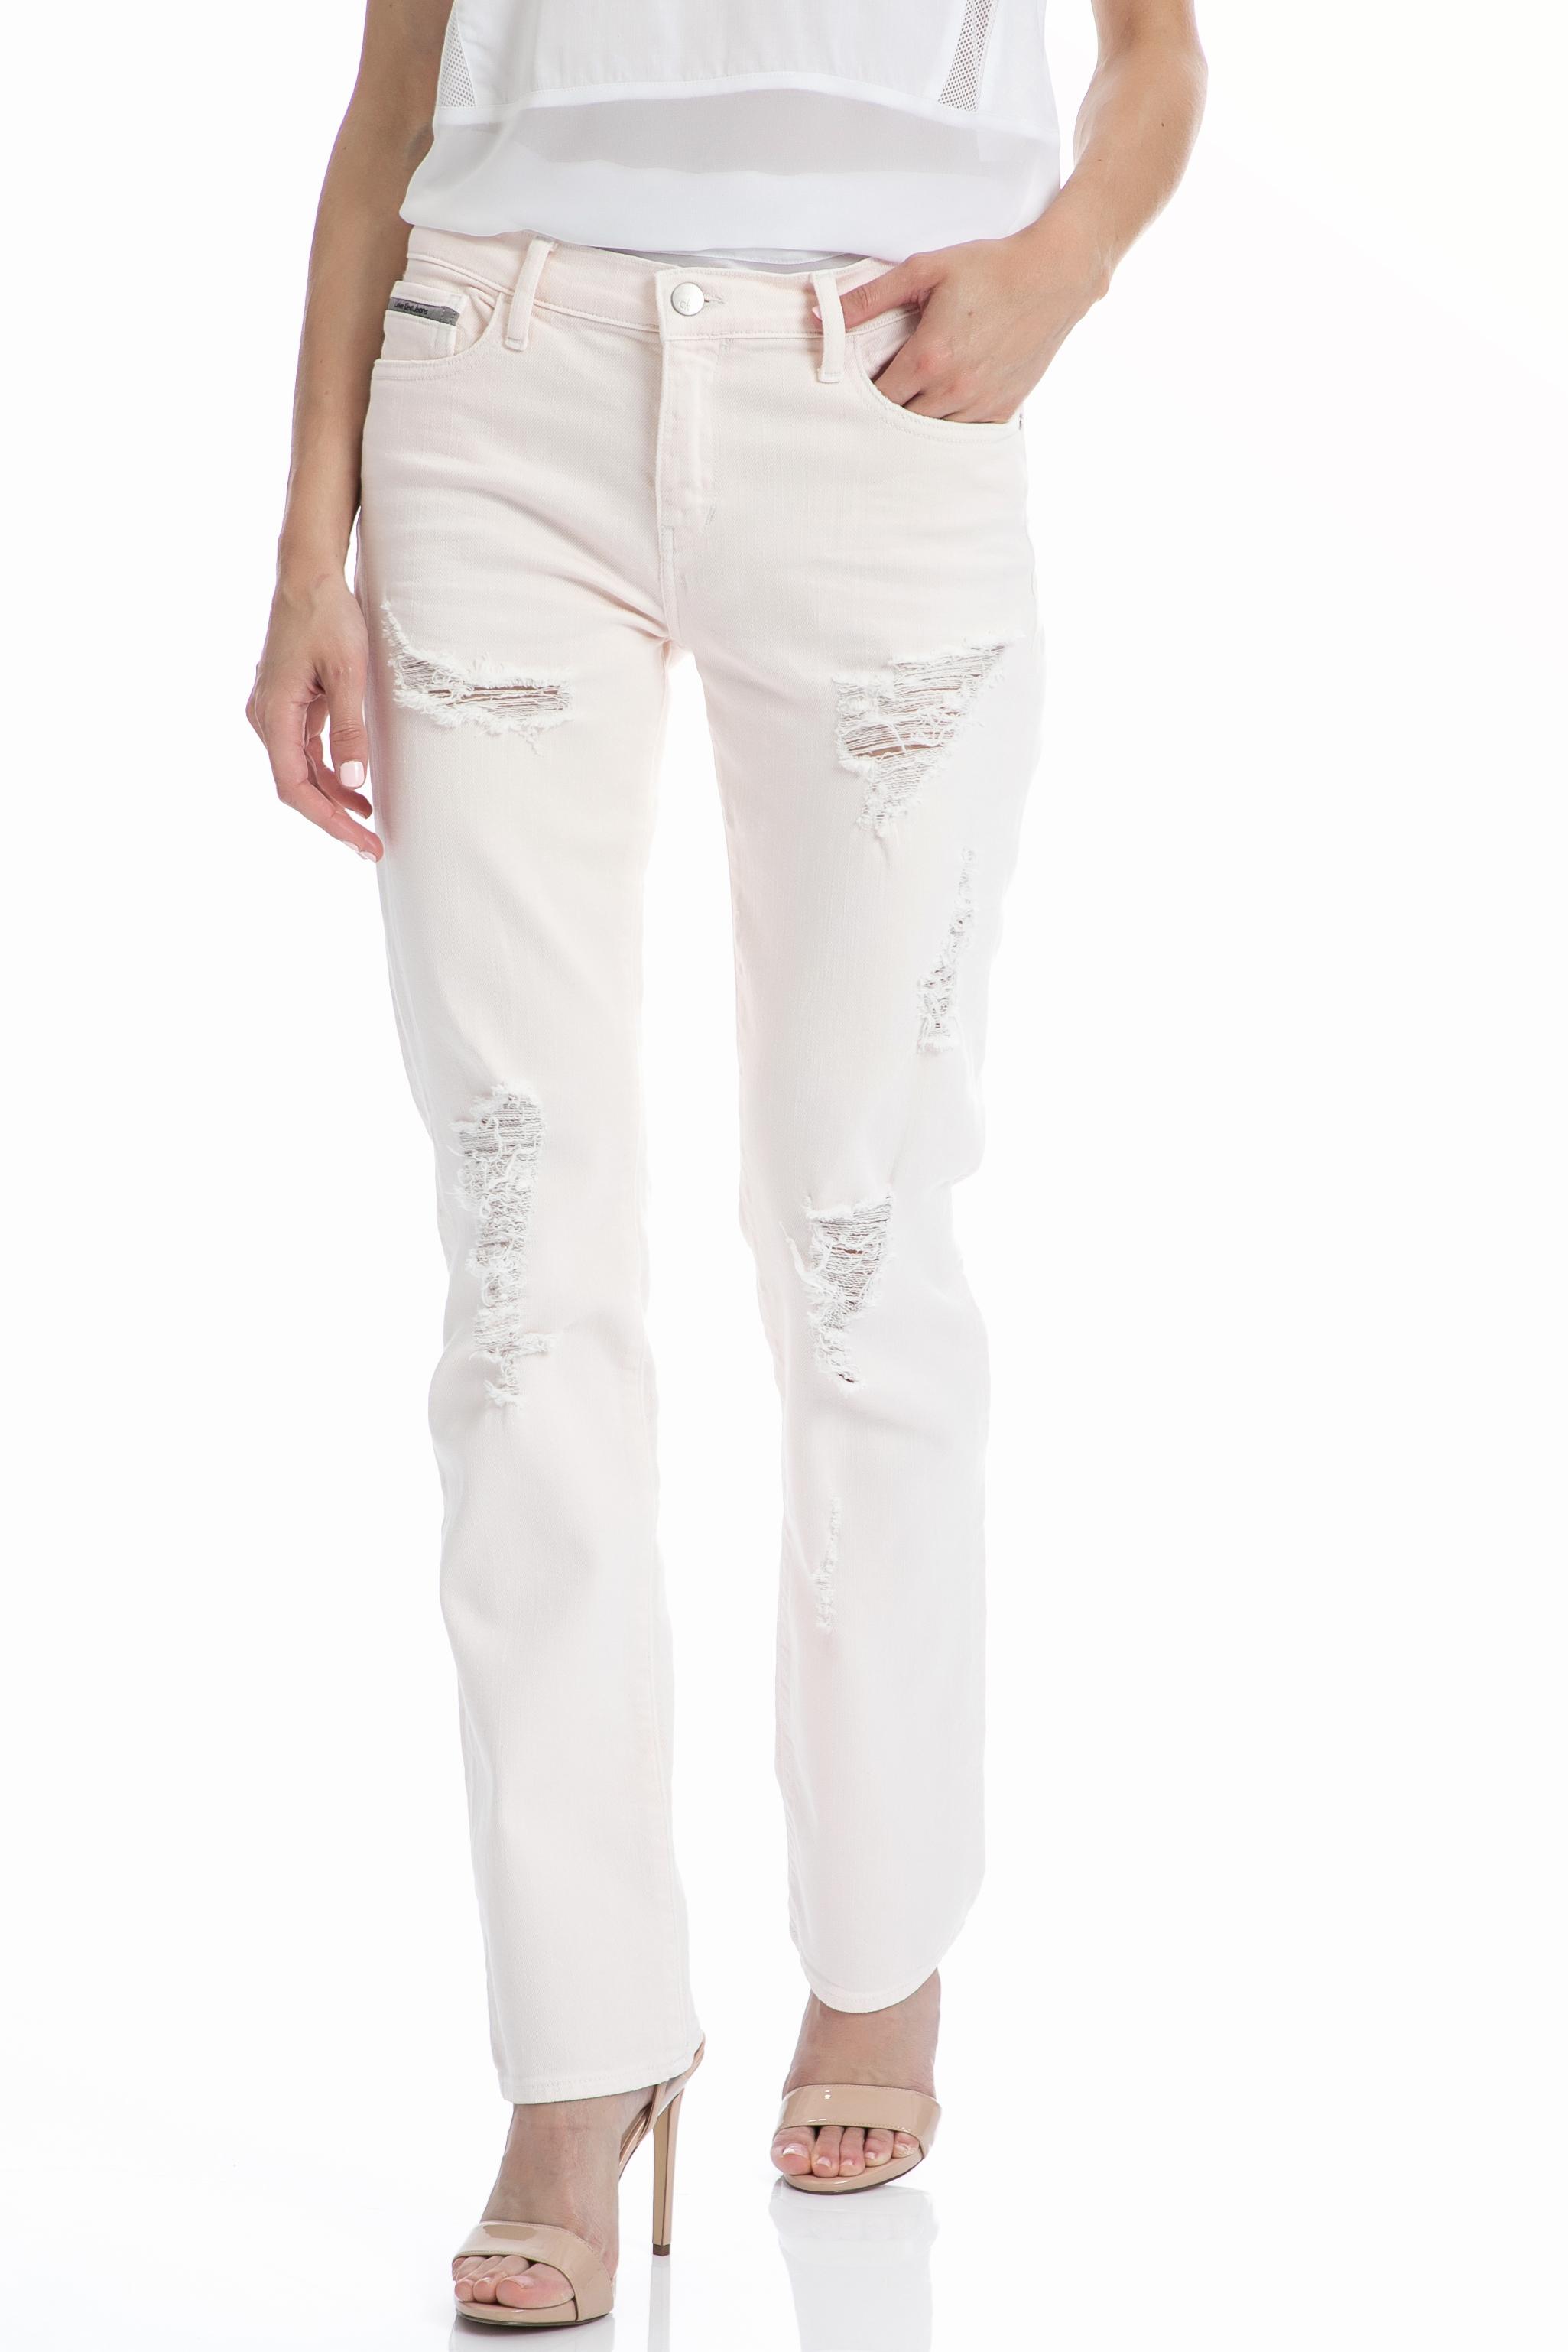 CALVIN KLEIN JEANS – Γυναικείο τζιν παντελόνι CALVIN KLEIN JEANS λευκό